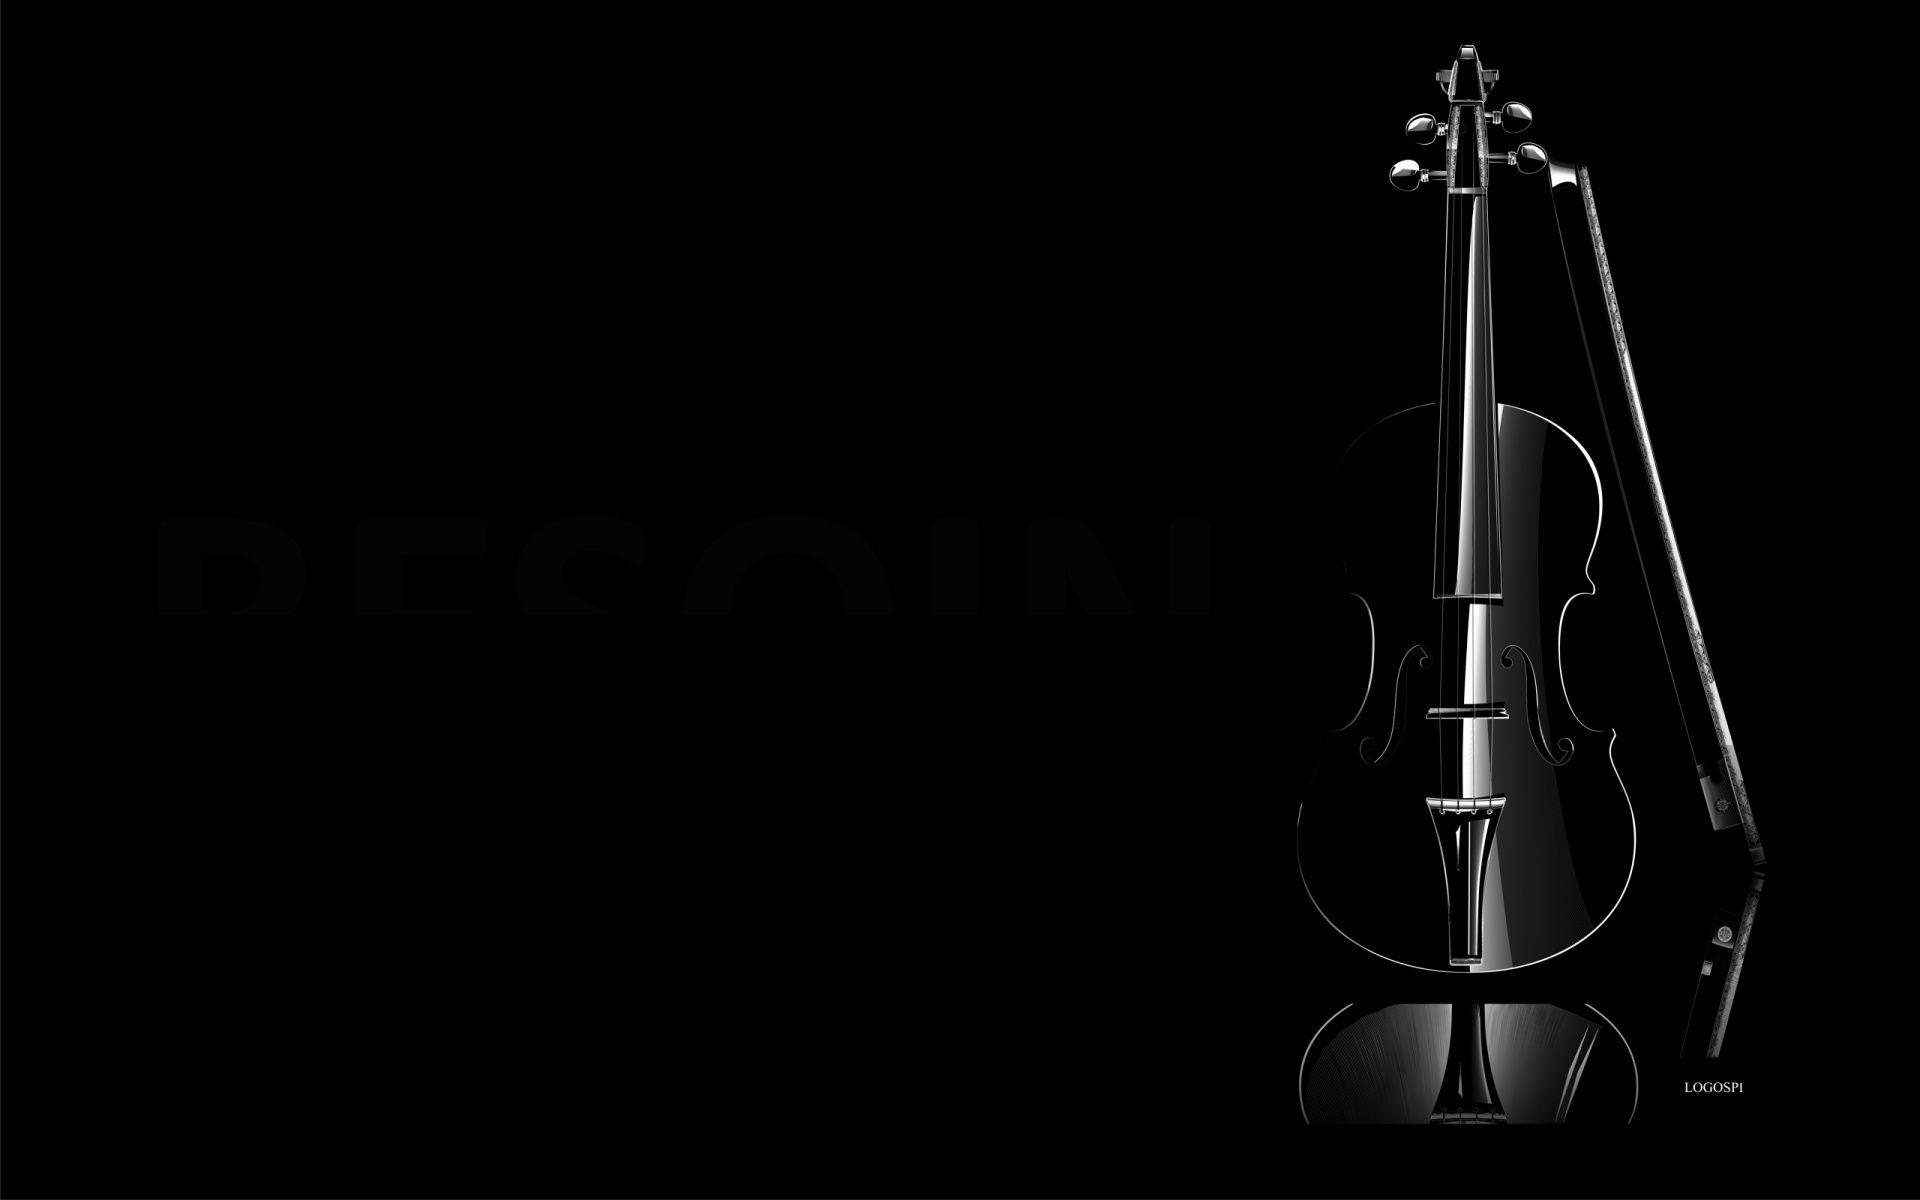 1920x1200 Black Violin Black Violin Black Wallpaper Violin